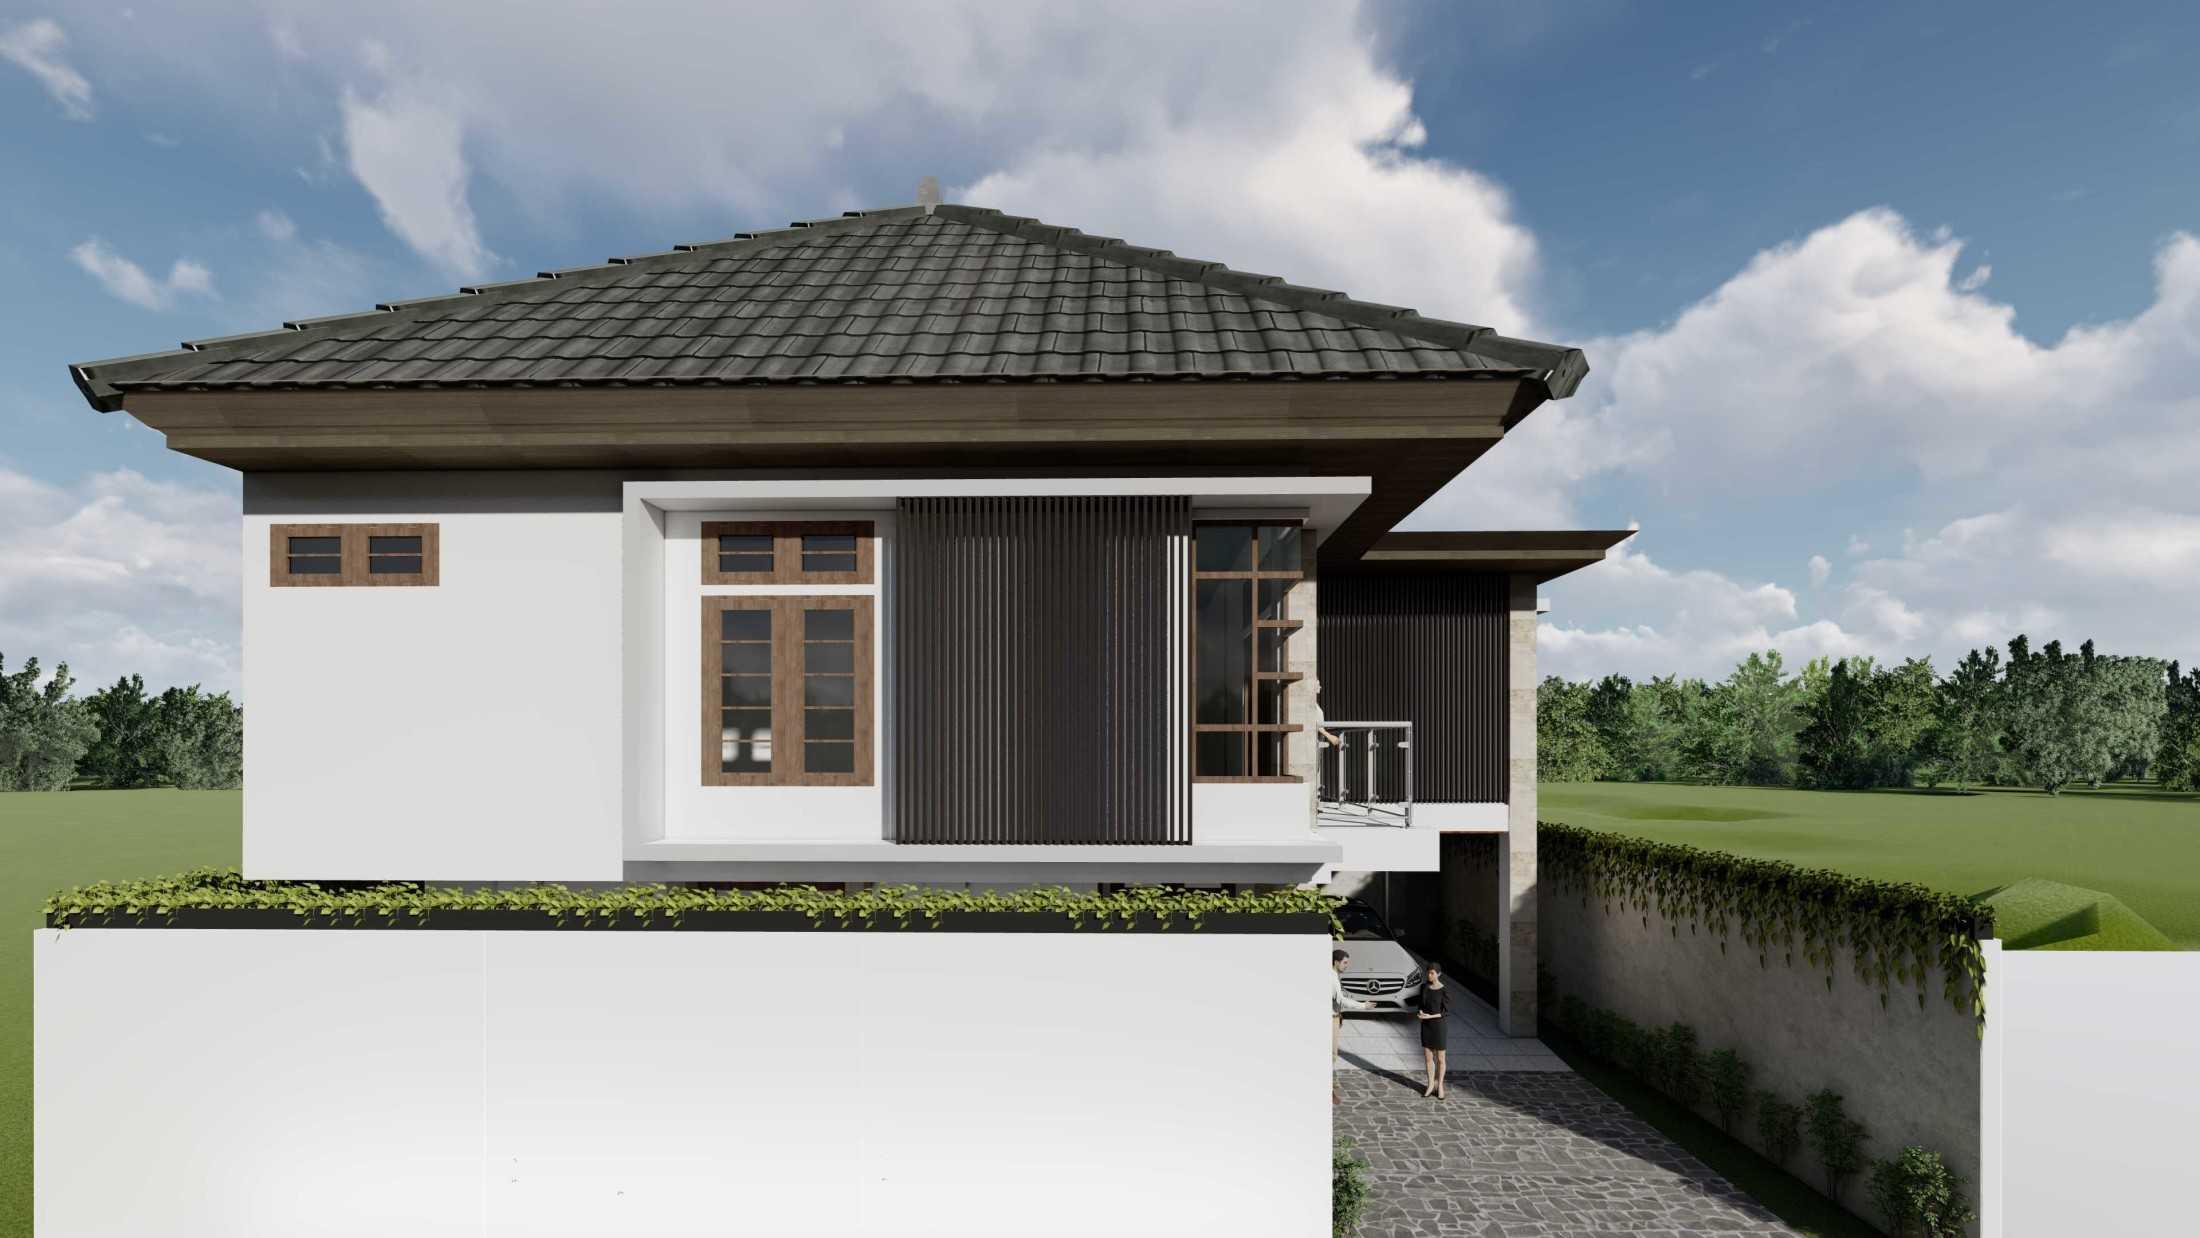 Astabumi Studio Js House Timor Leste Dili, Timor-Leste Pati, Kec. Pati, Kabupaten Pati, Jawa Tengah, Indonesia Cv-Astabumi-Manunggal-Prakarsa-Js-House-Timor-Leste  119266